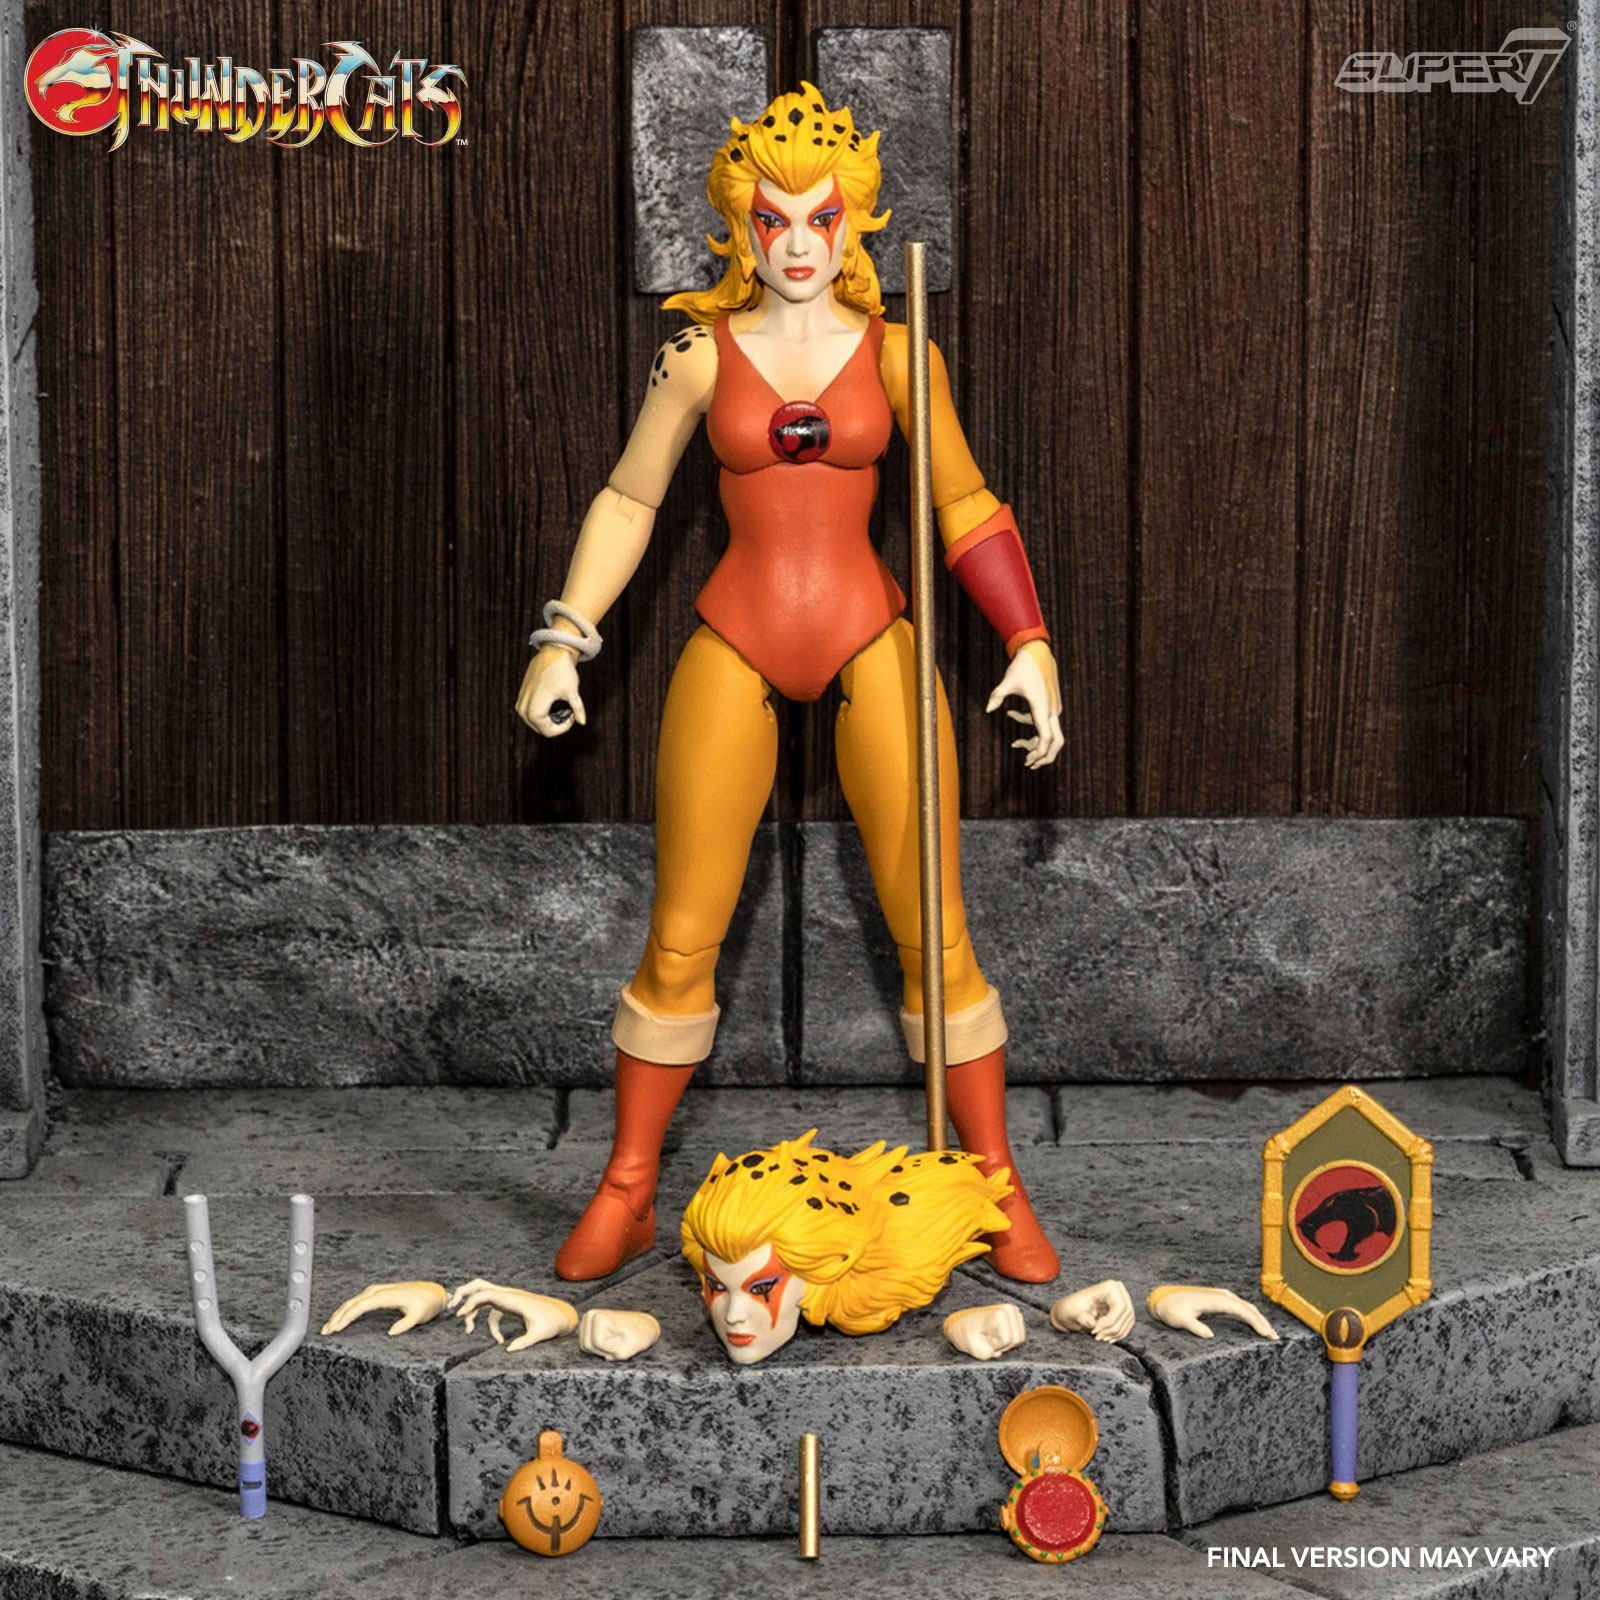 *PREORDER* Thundercats Ultimates Action Figure: CHEETARA THE SUPER SPEEDY THUNDERCATS WARRIOR by Super7